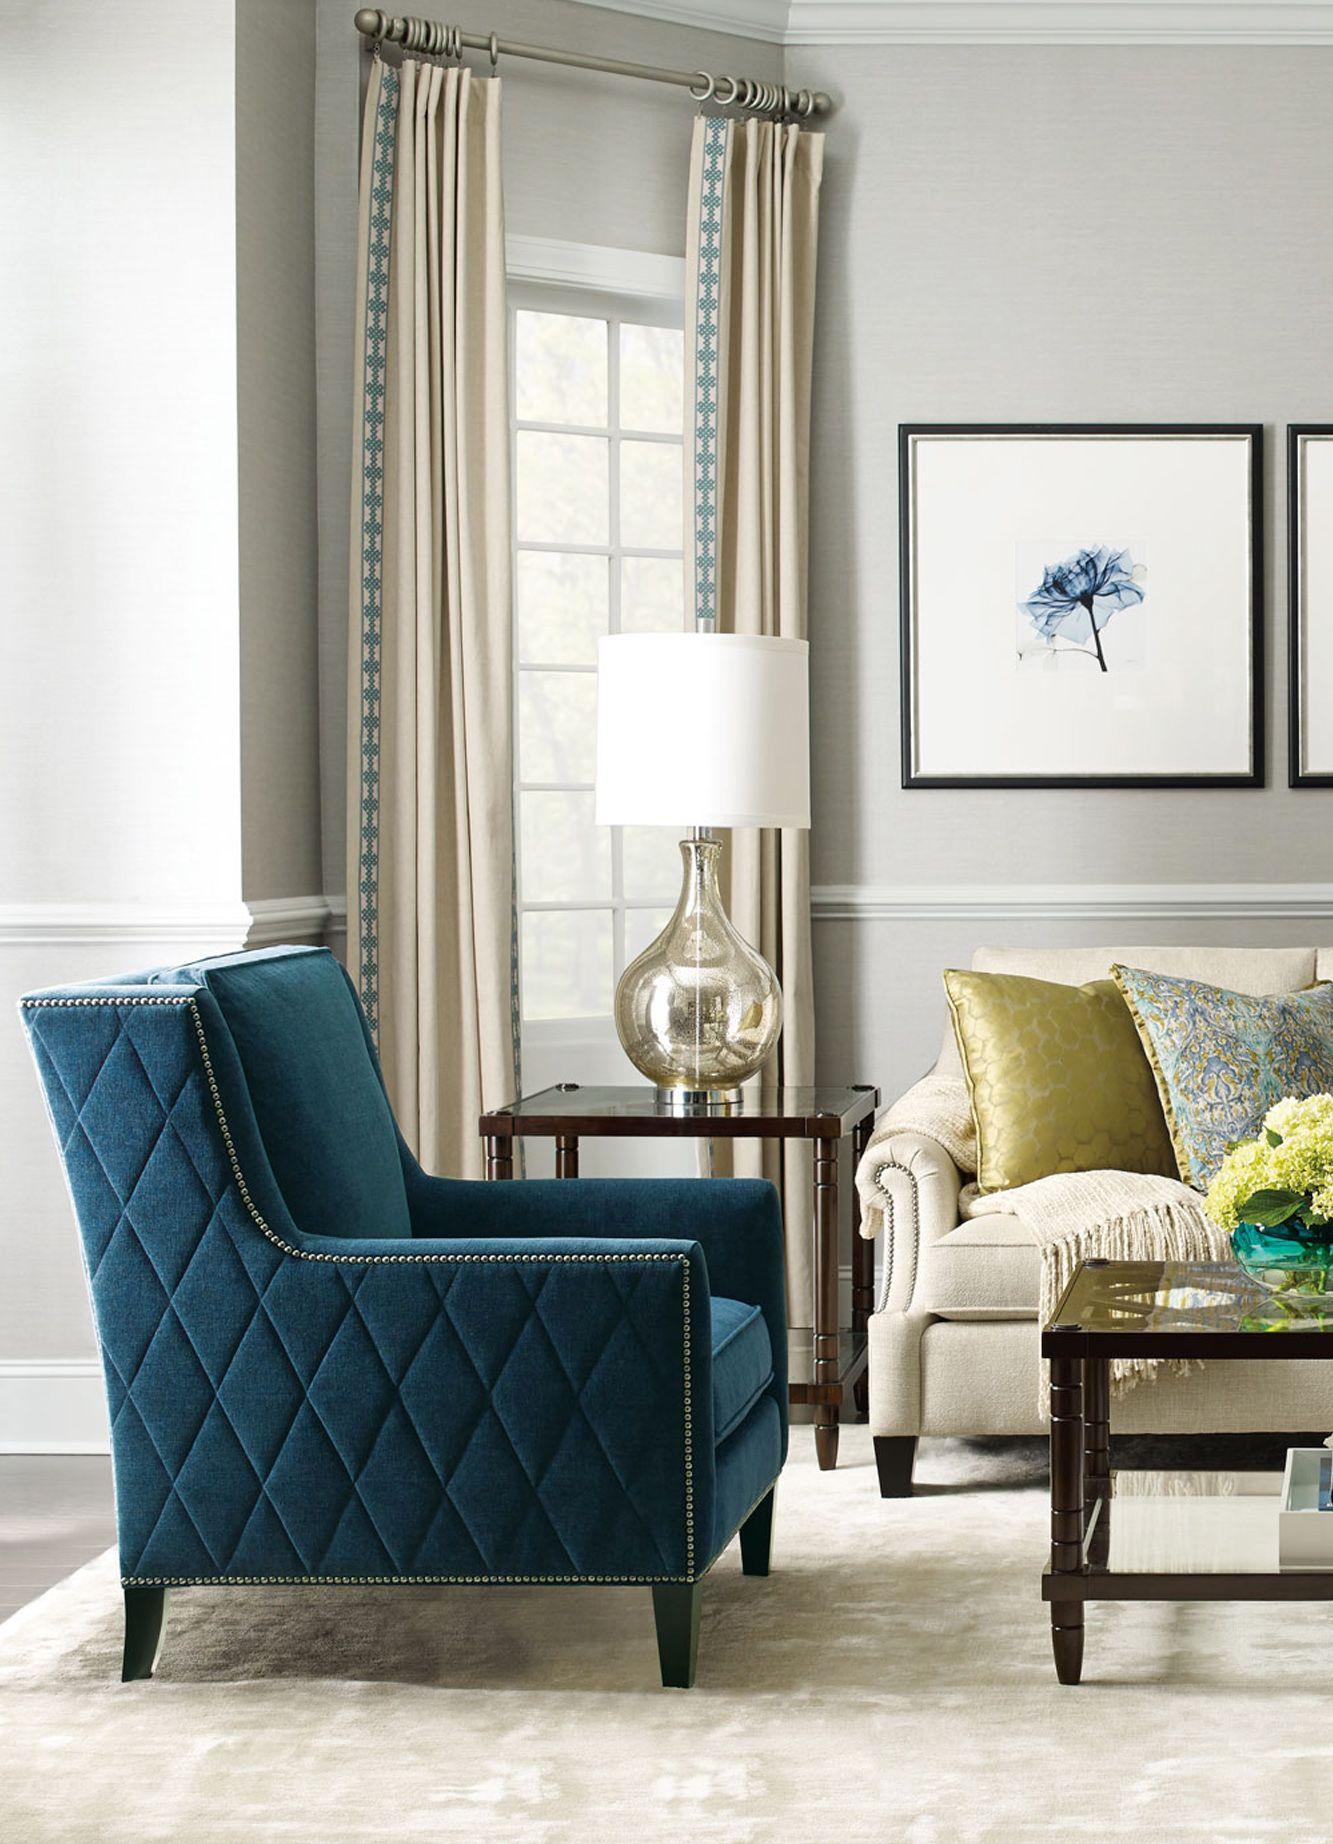 Bernhardt | Almada Chair with diamond trapunto, in deep teal woven ...